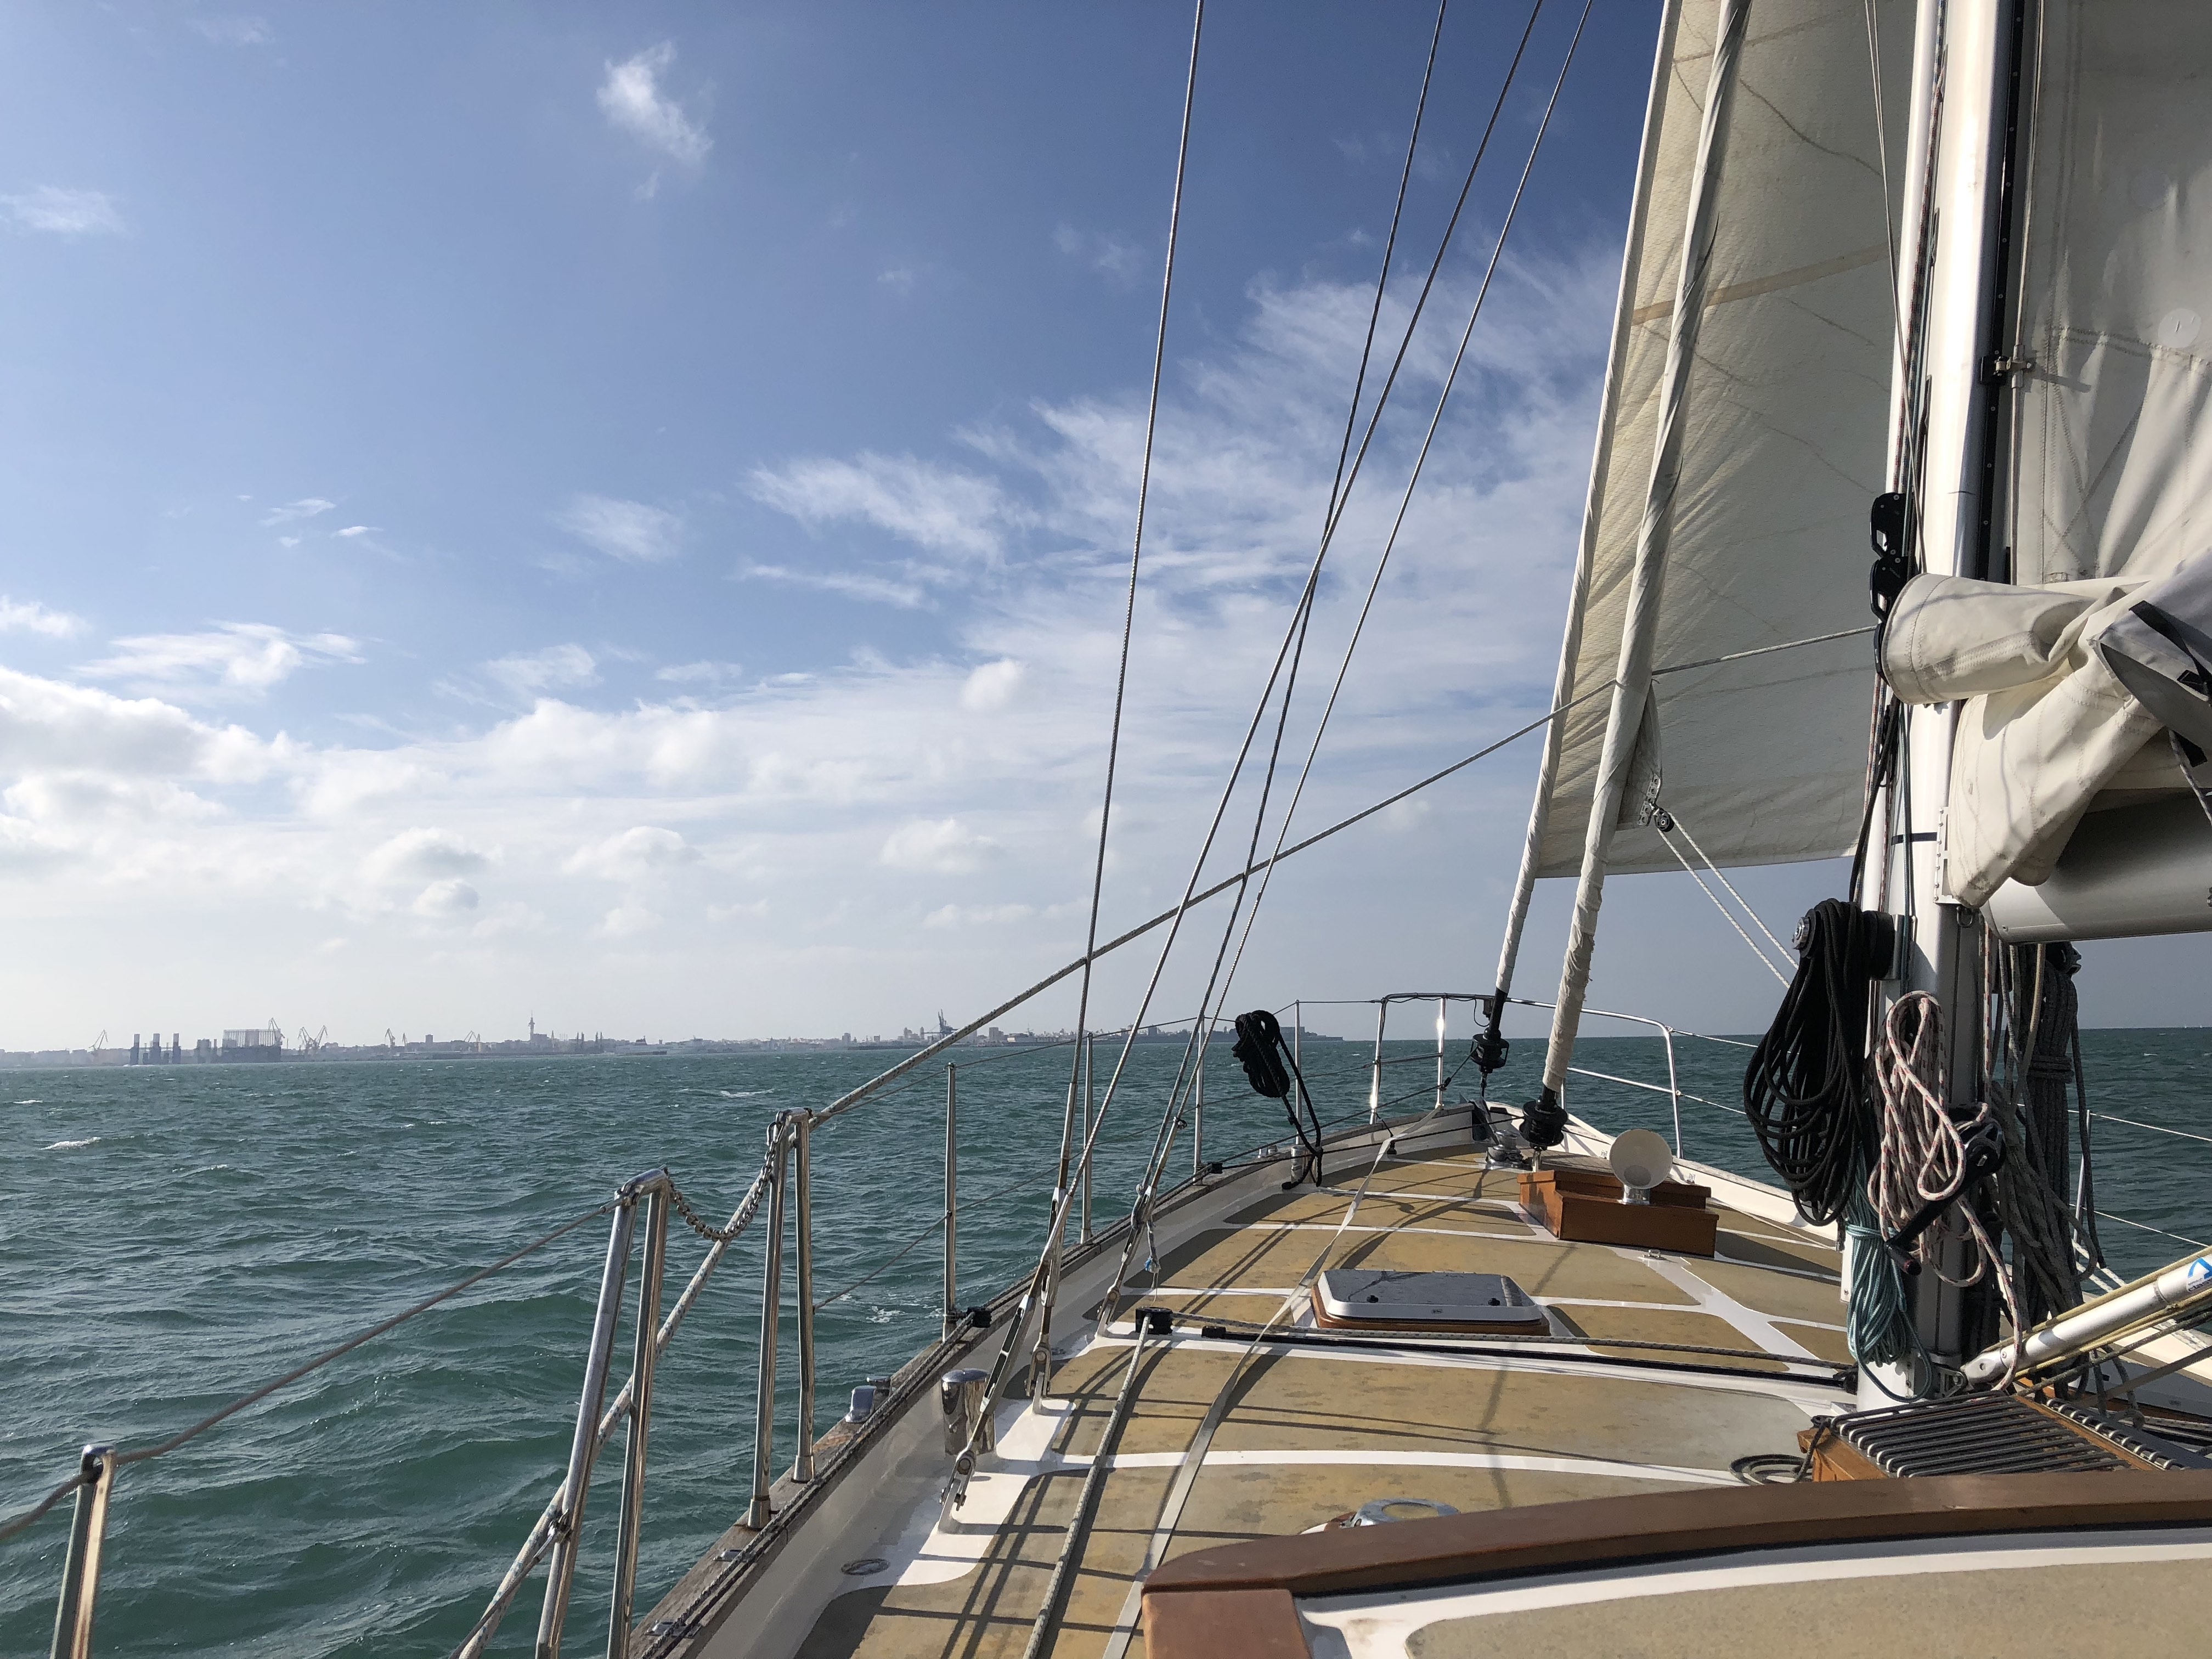 Sailing in the Bay of Cadiz